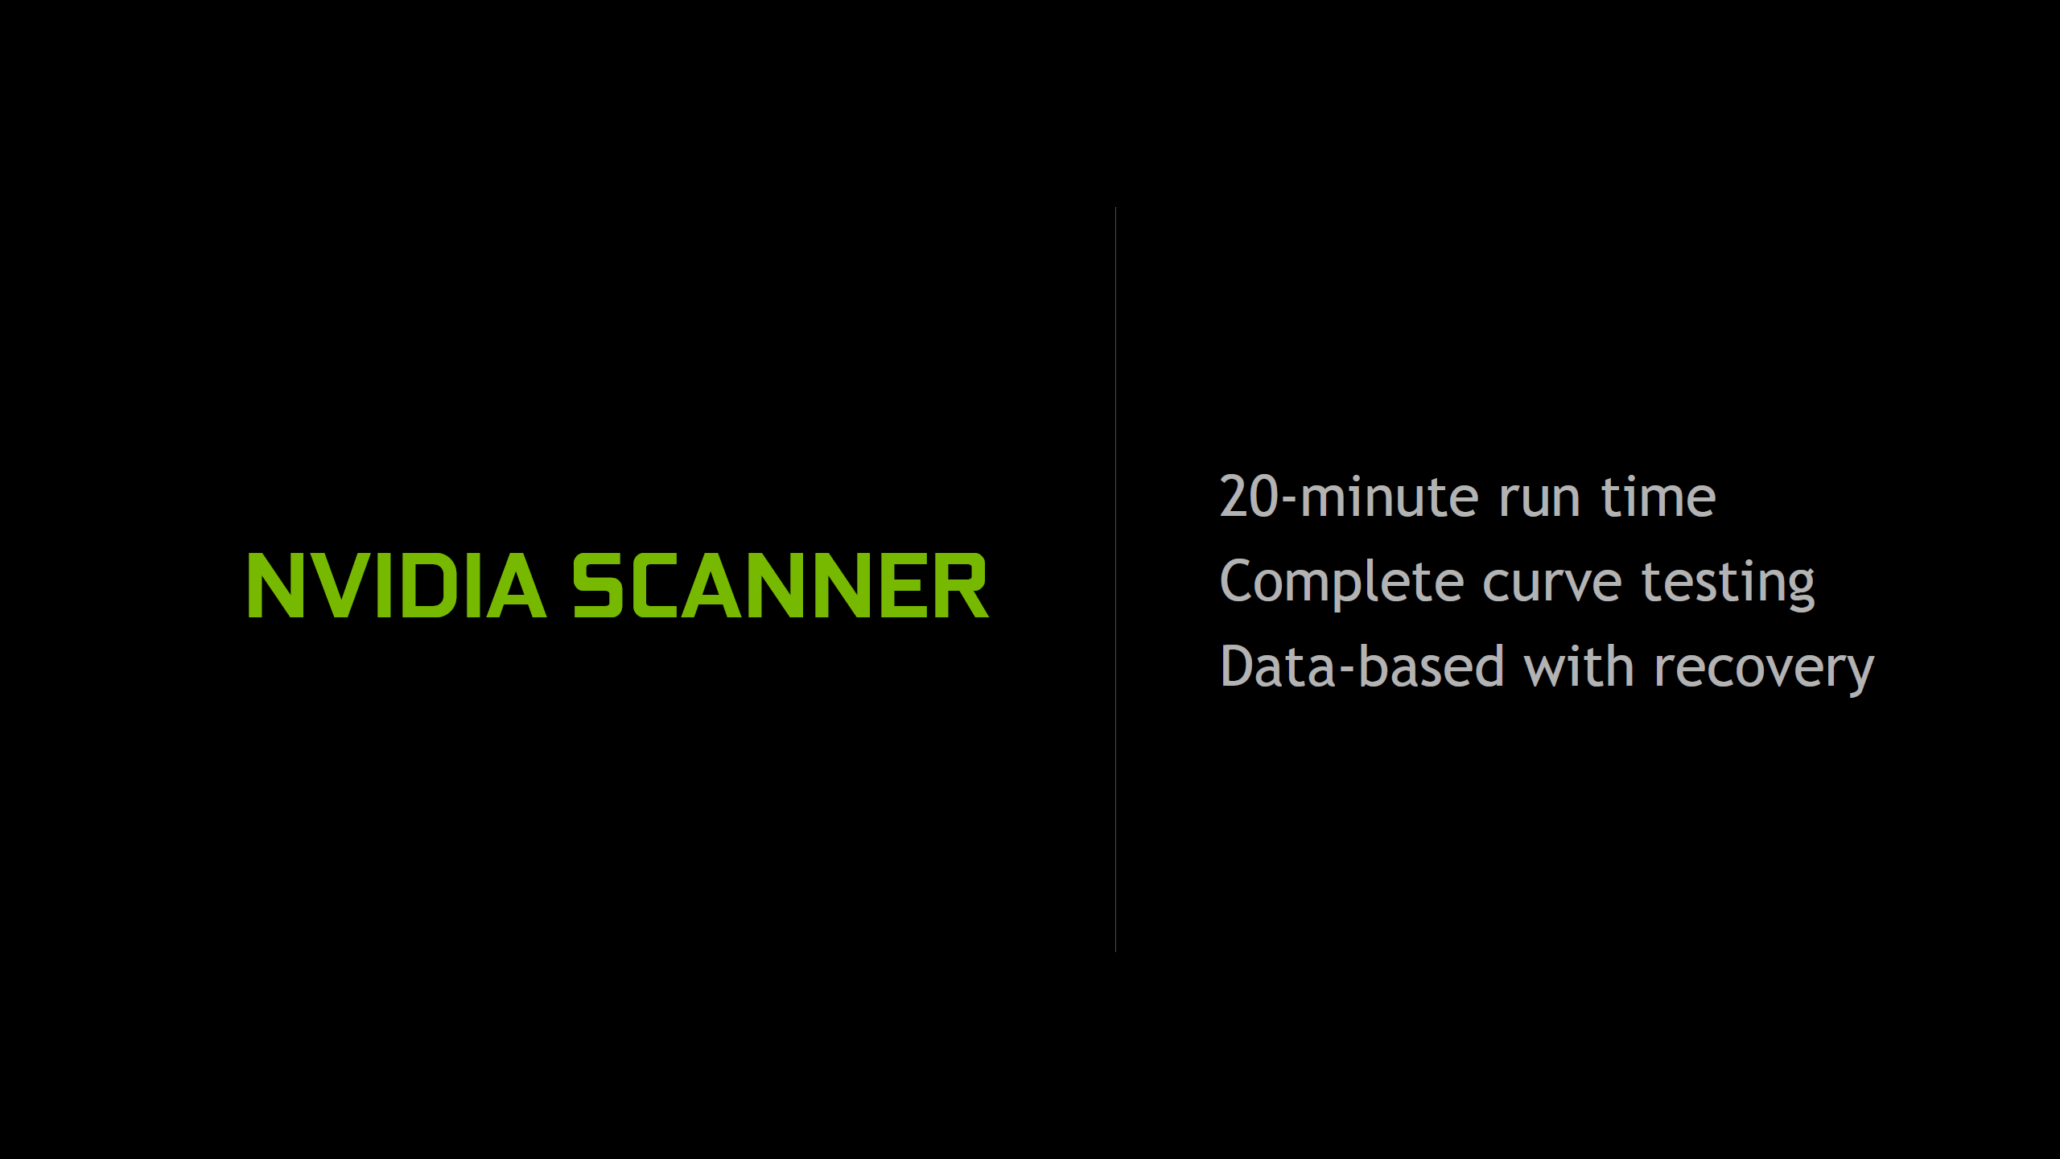 nvidia-geforce-20-series_official_oc-sli_nvidia-scanner_4